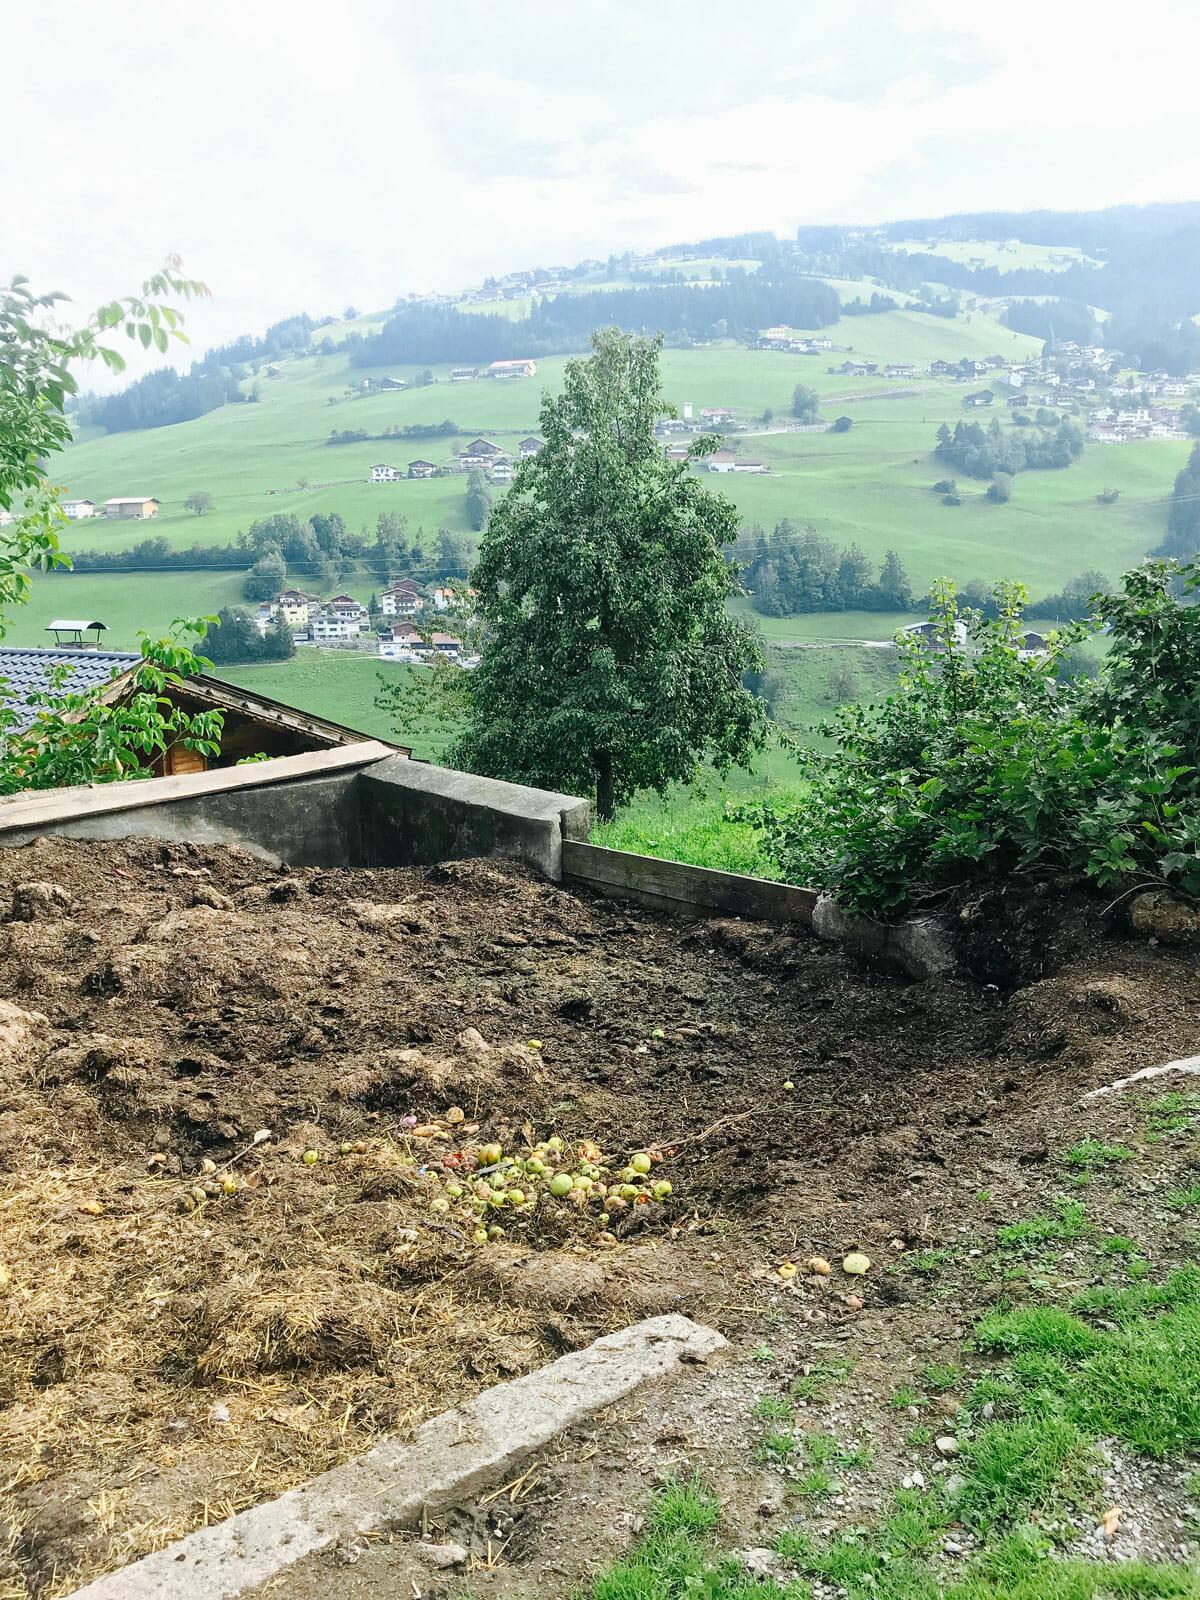 Lawren Spera & Steve Ingham - Trip to Austria